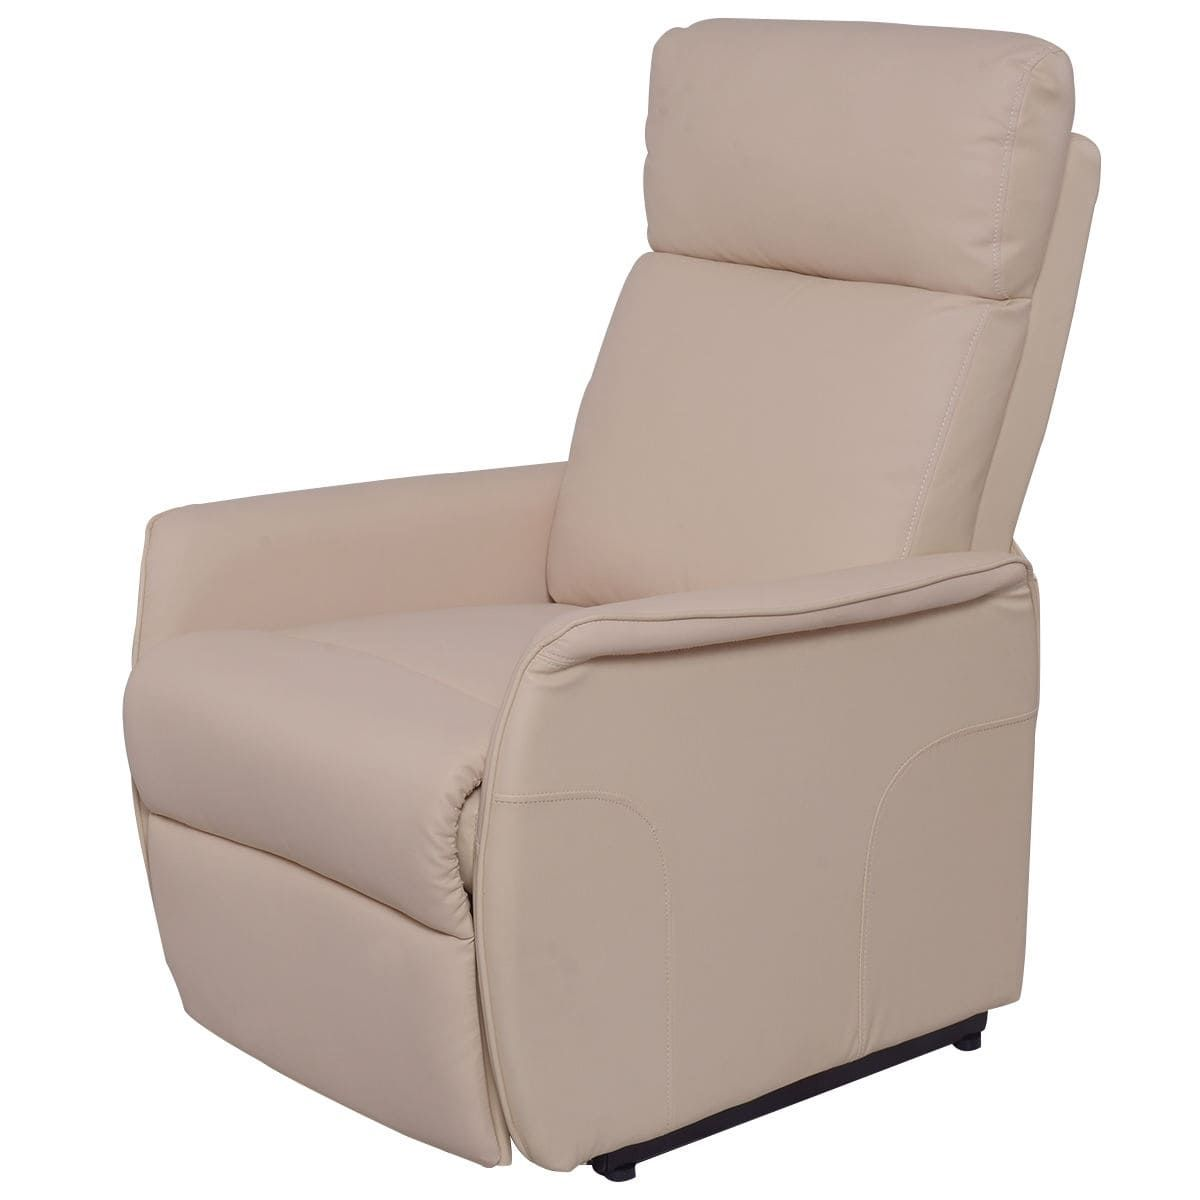 Costway PU Electric Lift Chair Power Recliner Reclining Sofa Lounge ...